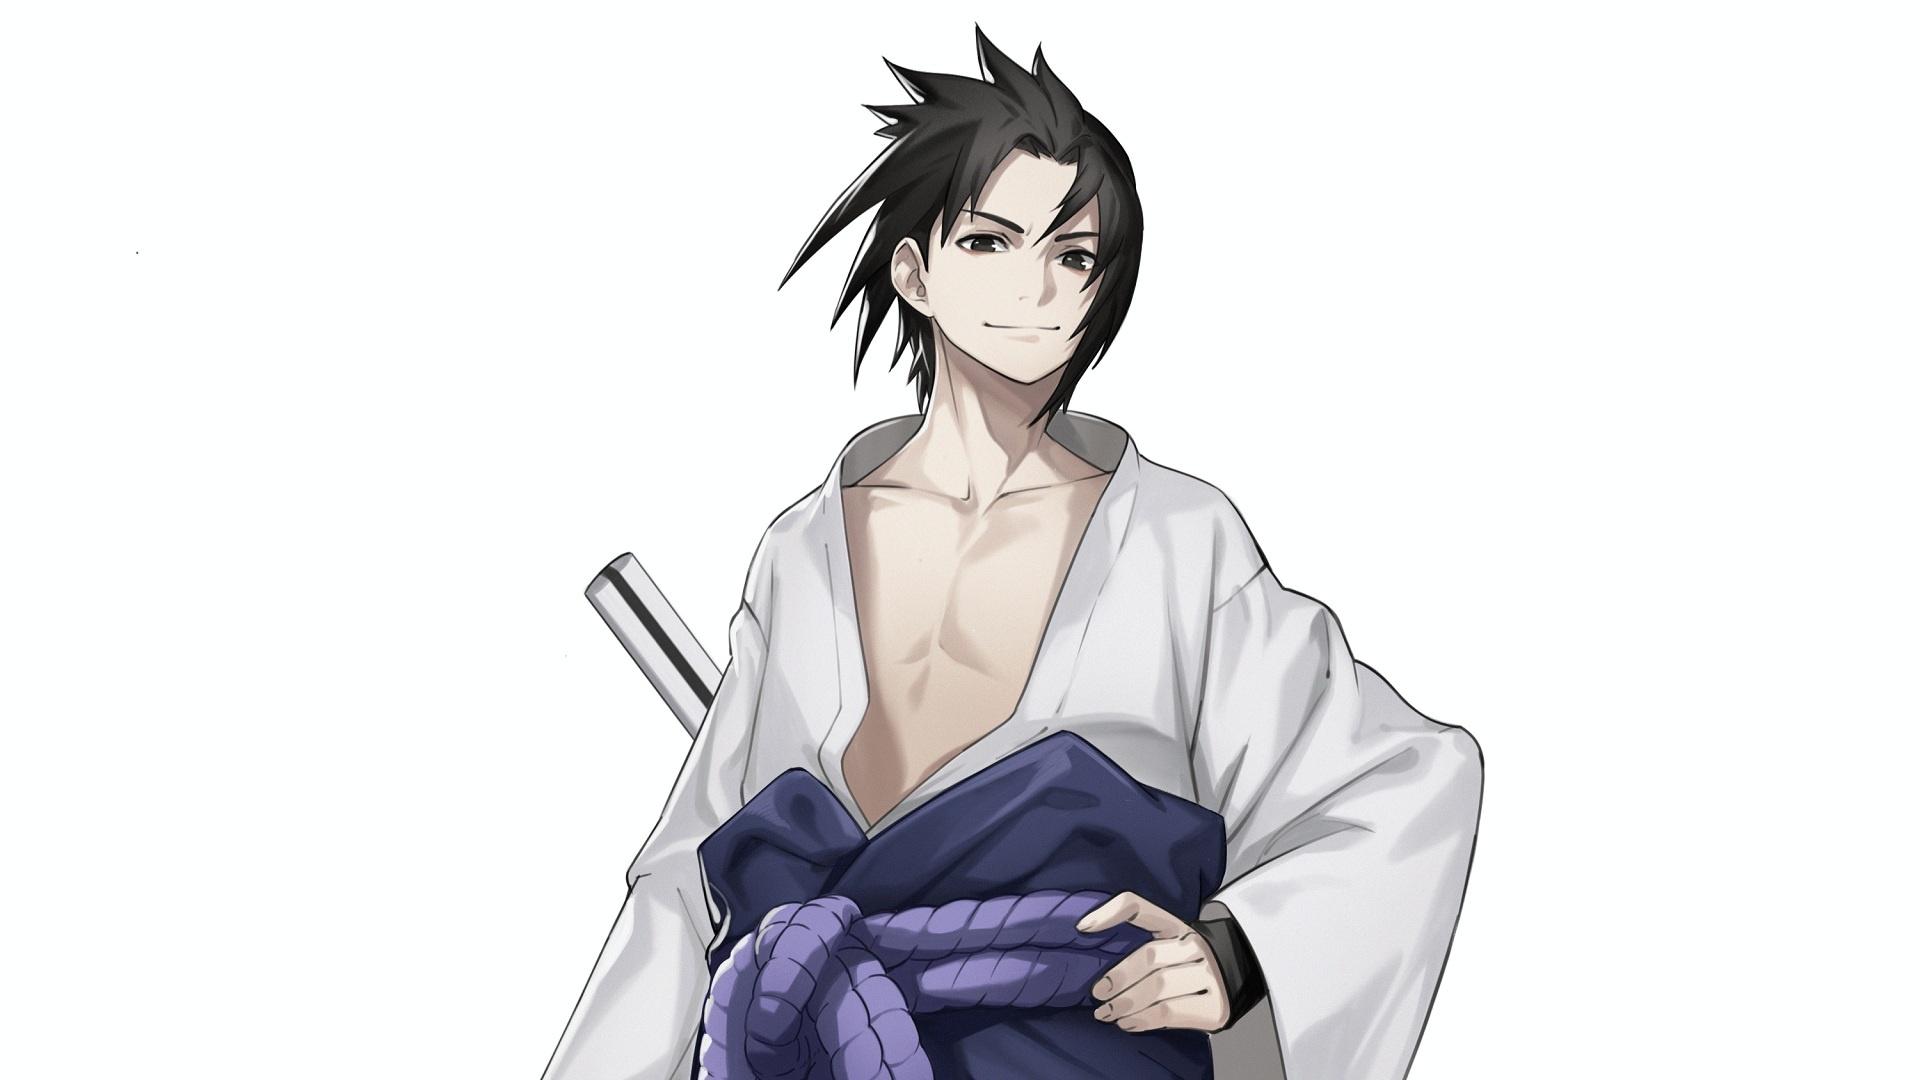 Sasuke background wallpaper